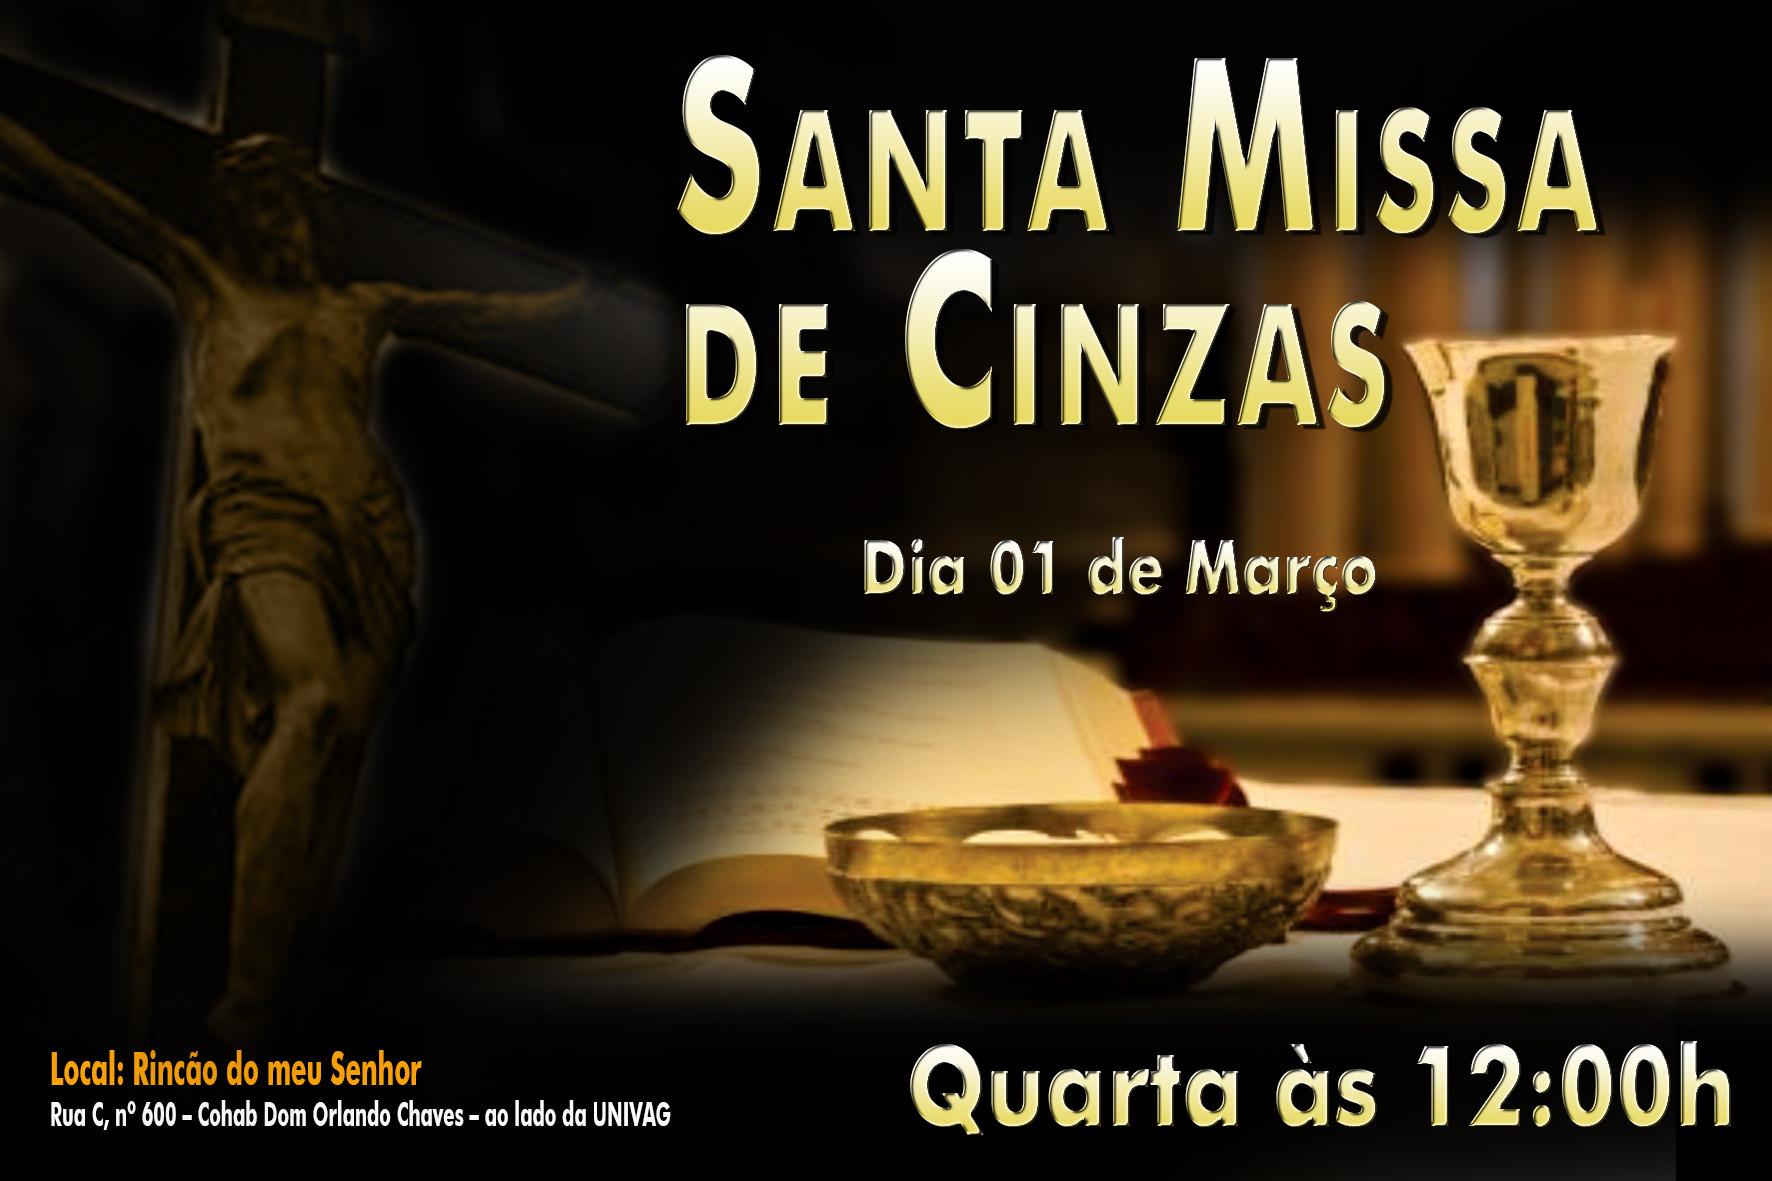 Santa Missa Quarta - Feira de Cinzas